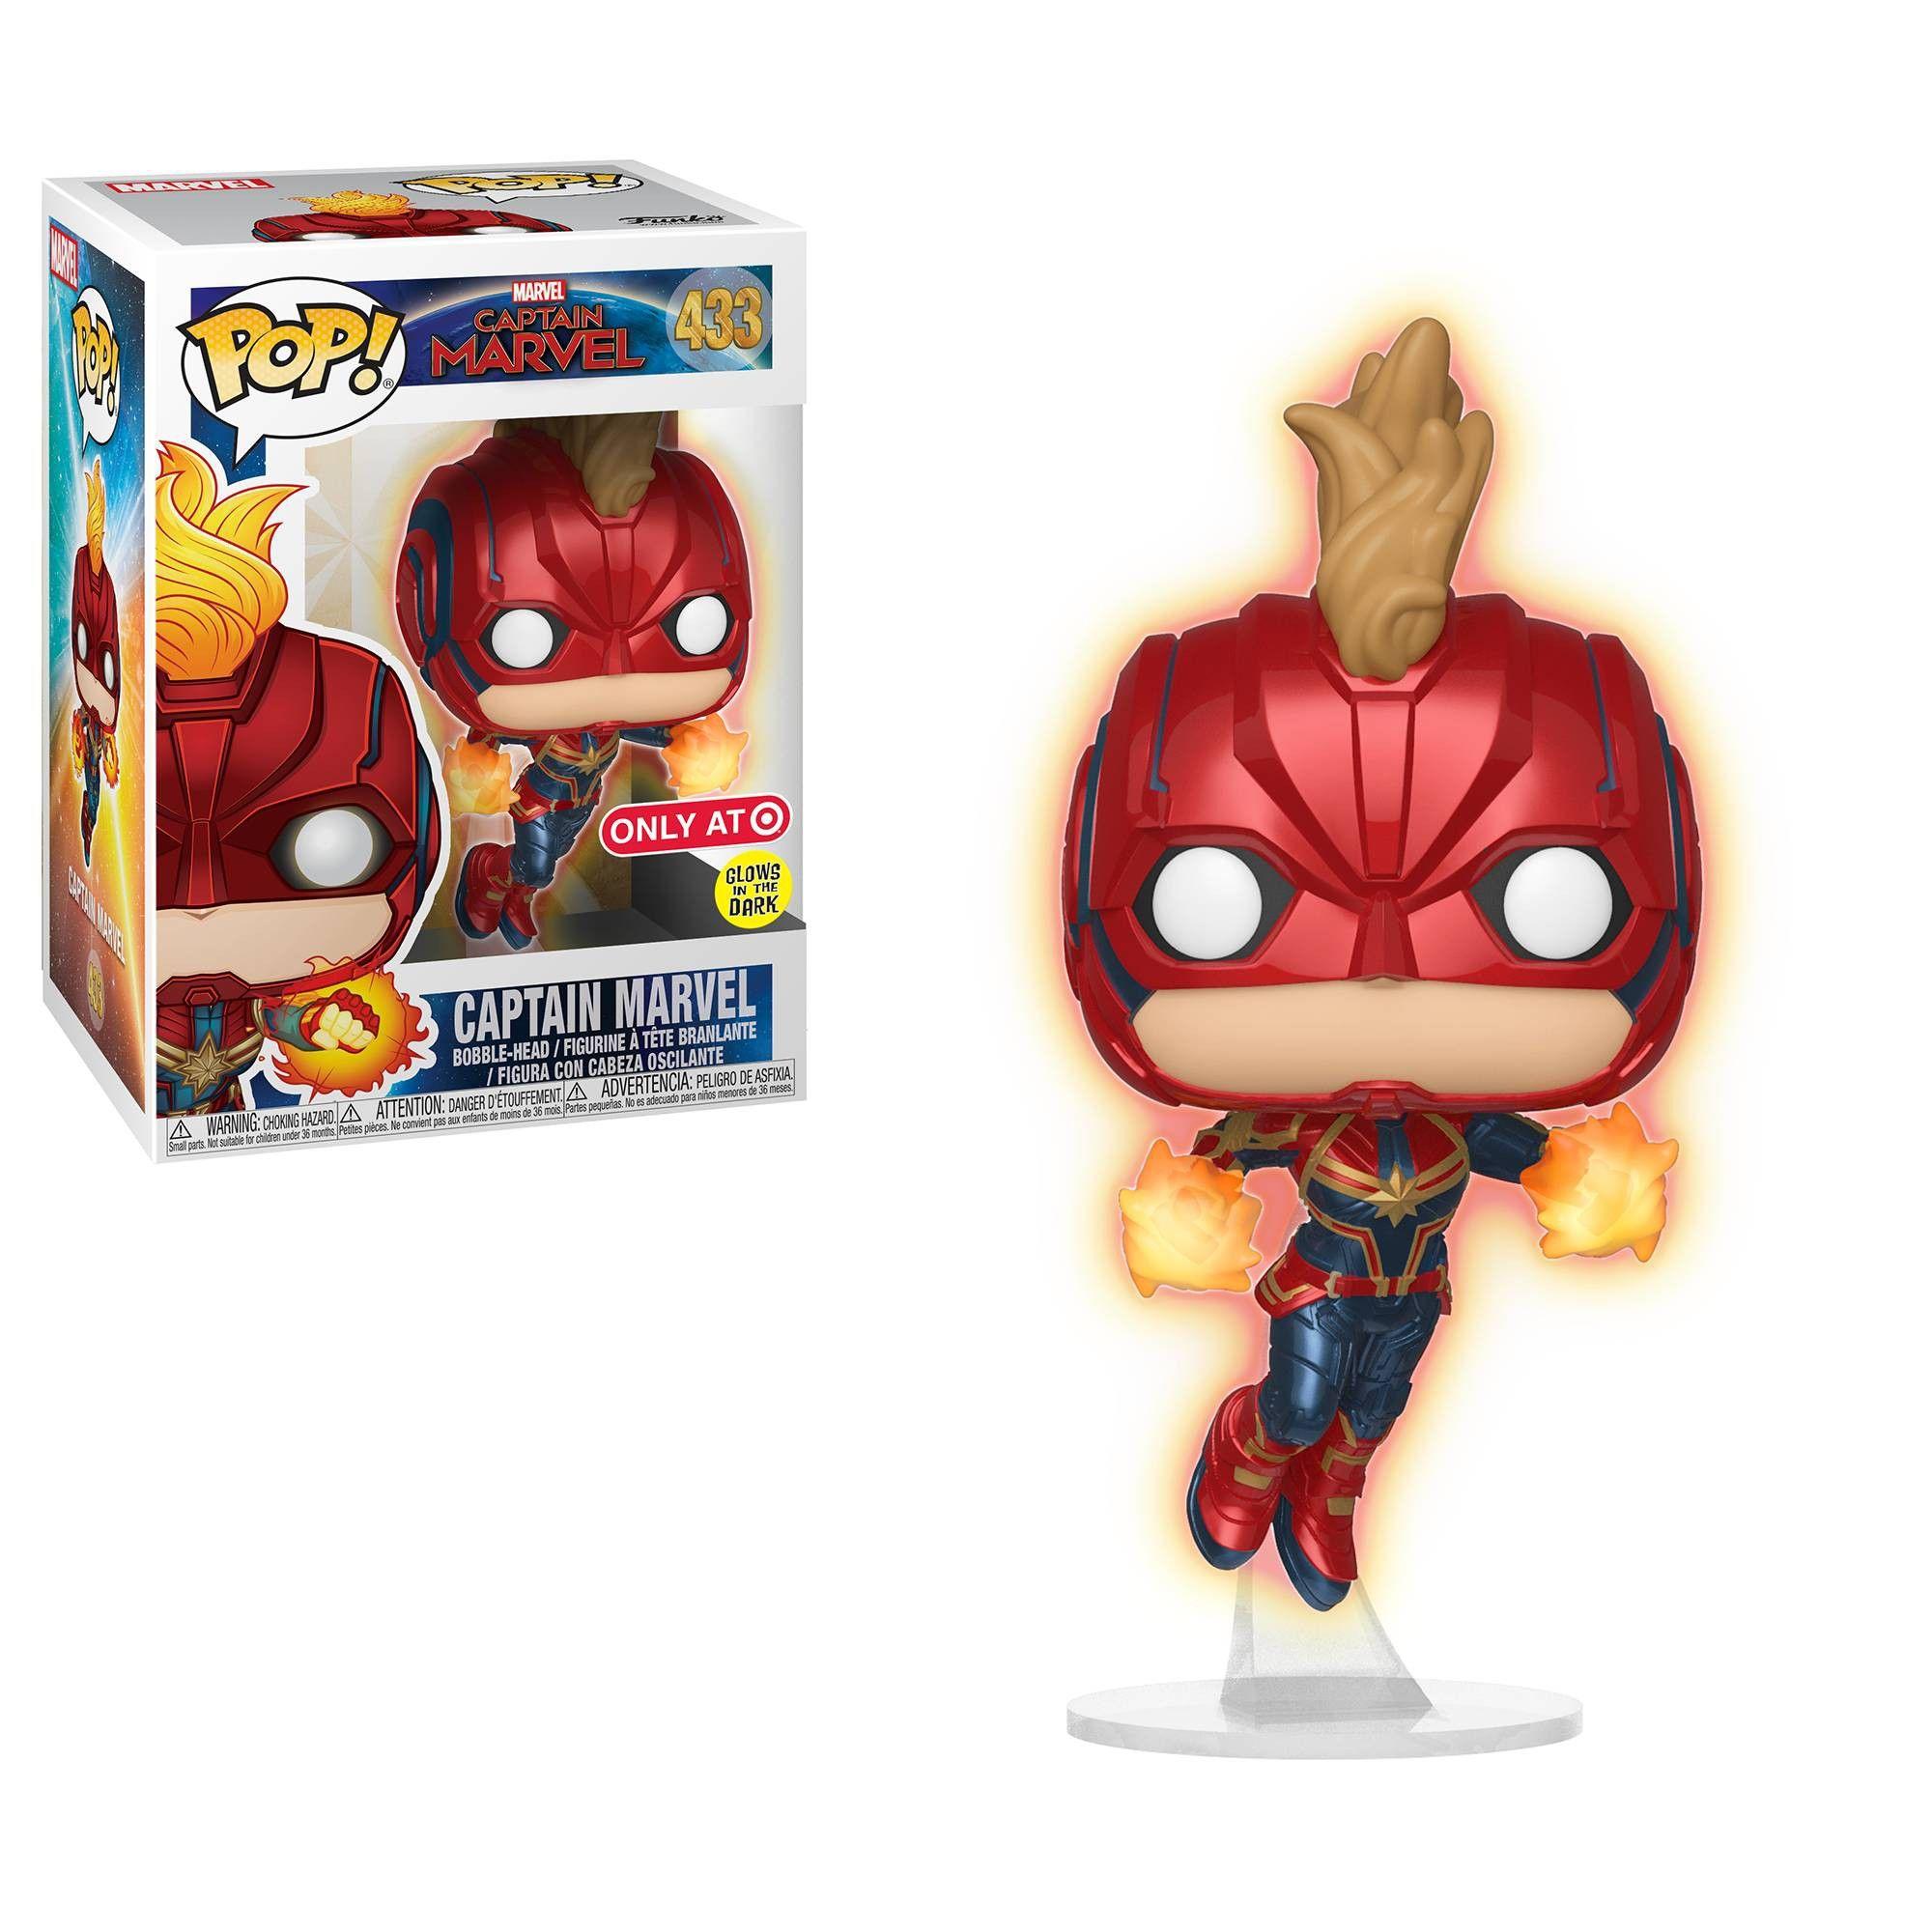 funko pop! marvel: captain marvel - glow in the dark flying